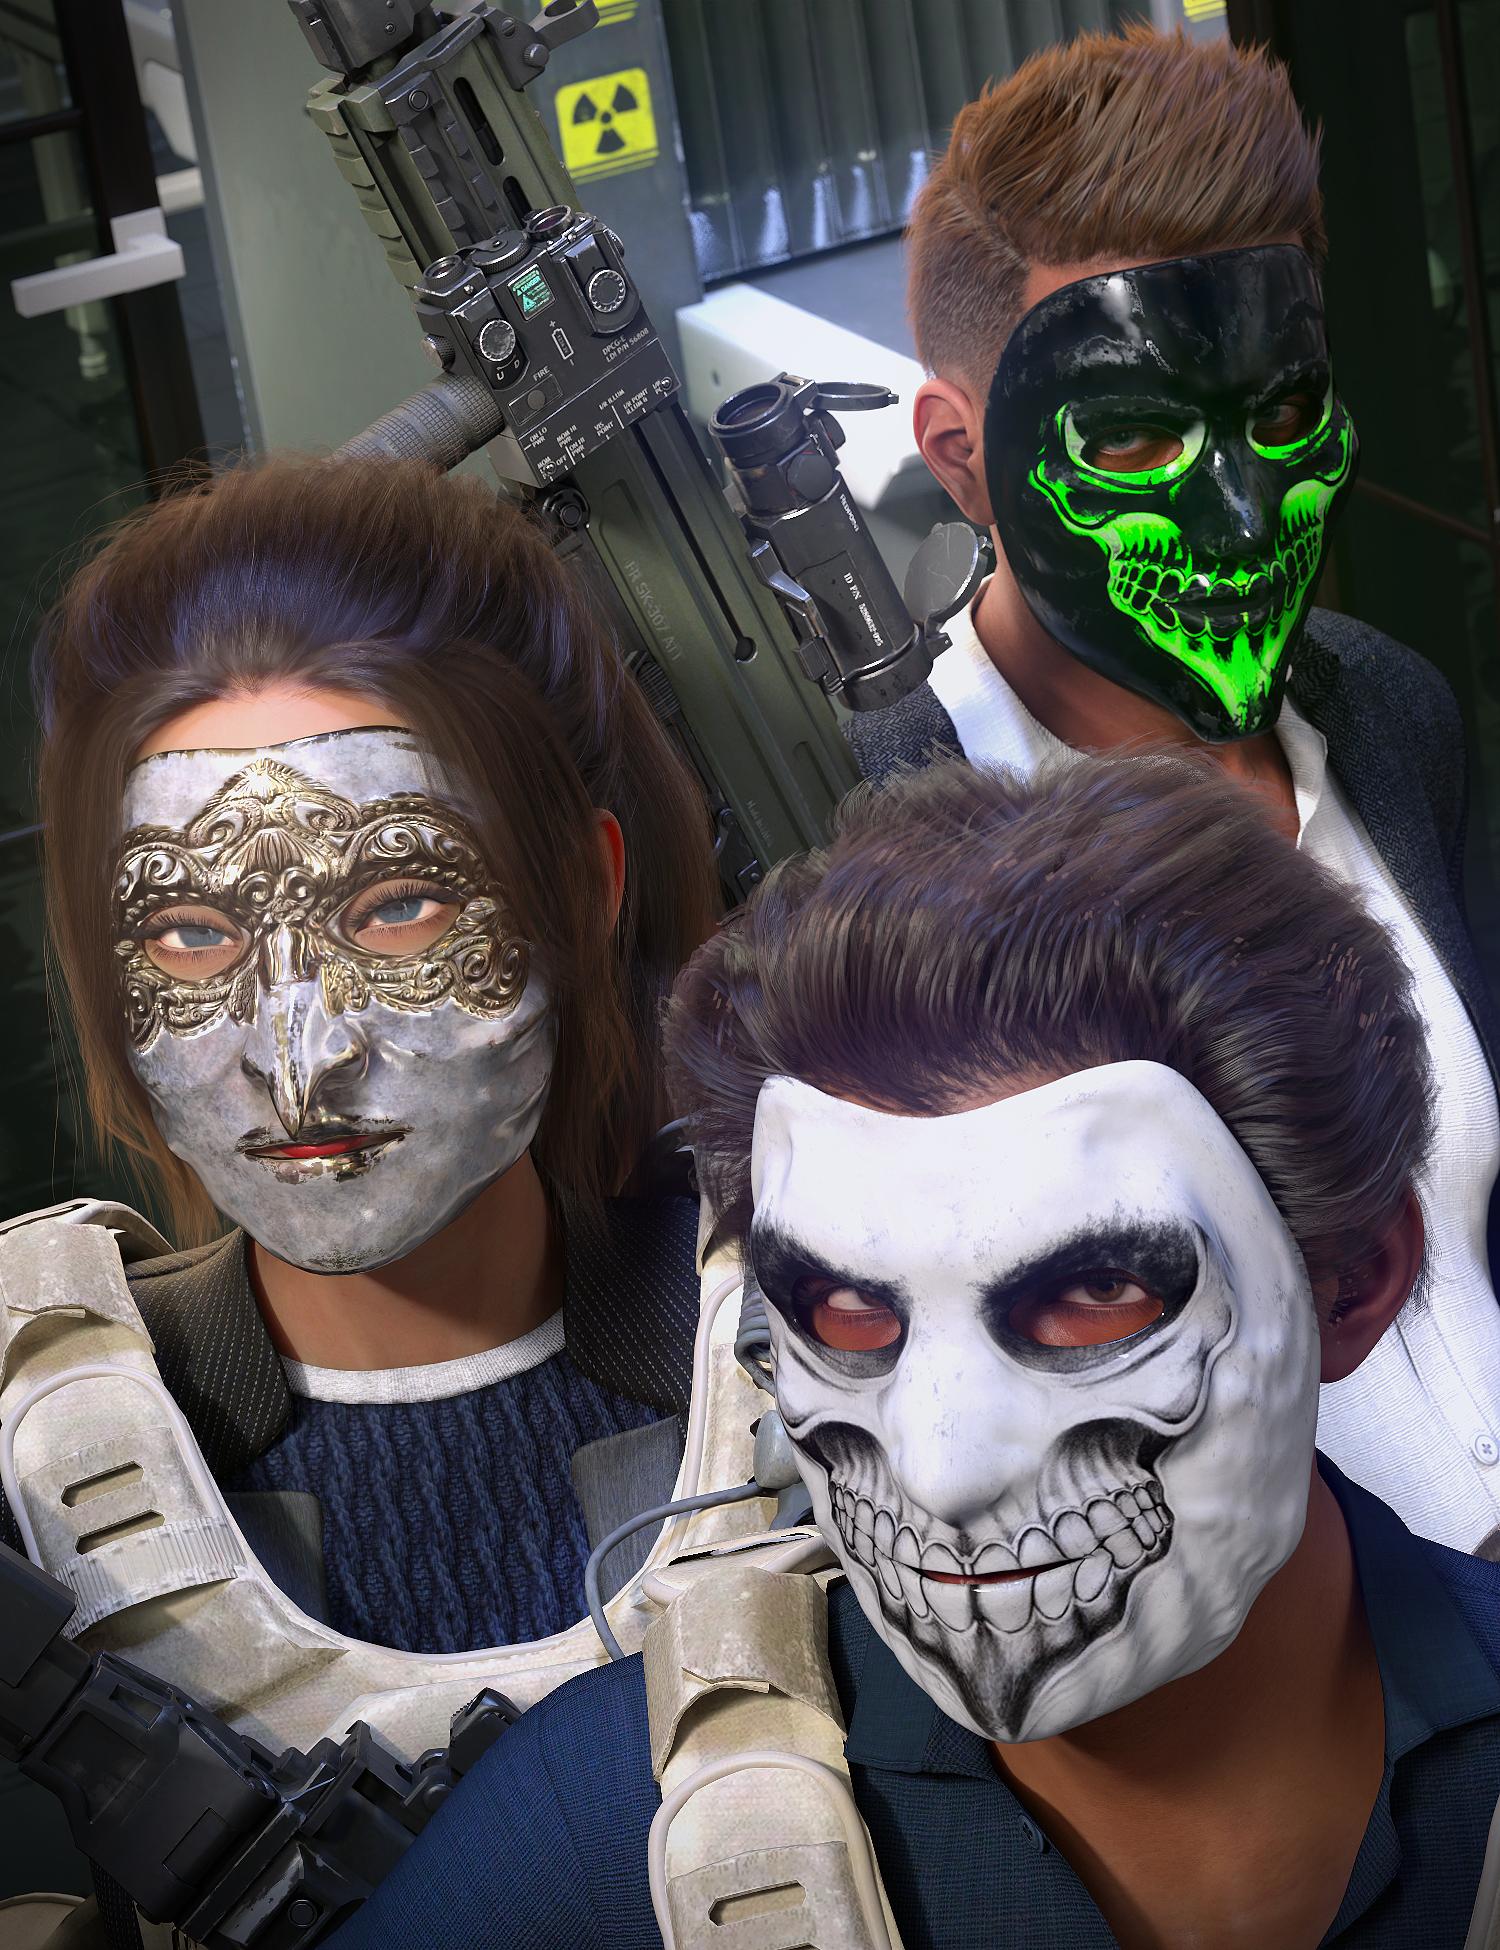 Morphing Heist Masks for Genesis 8.1 by: ArkiShox-Design, 3D Models by Daz 3D